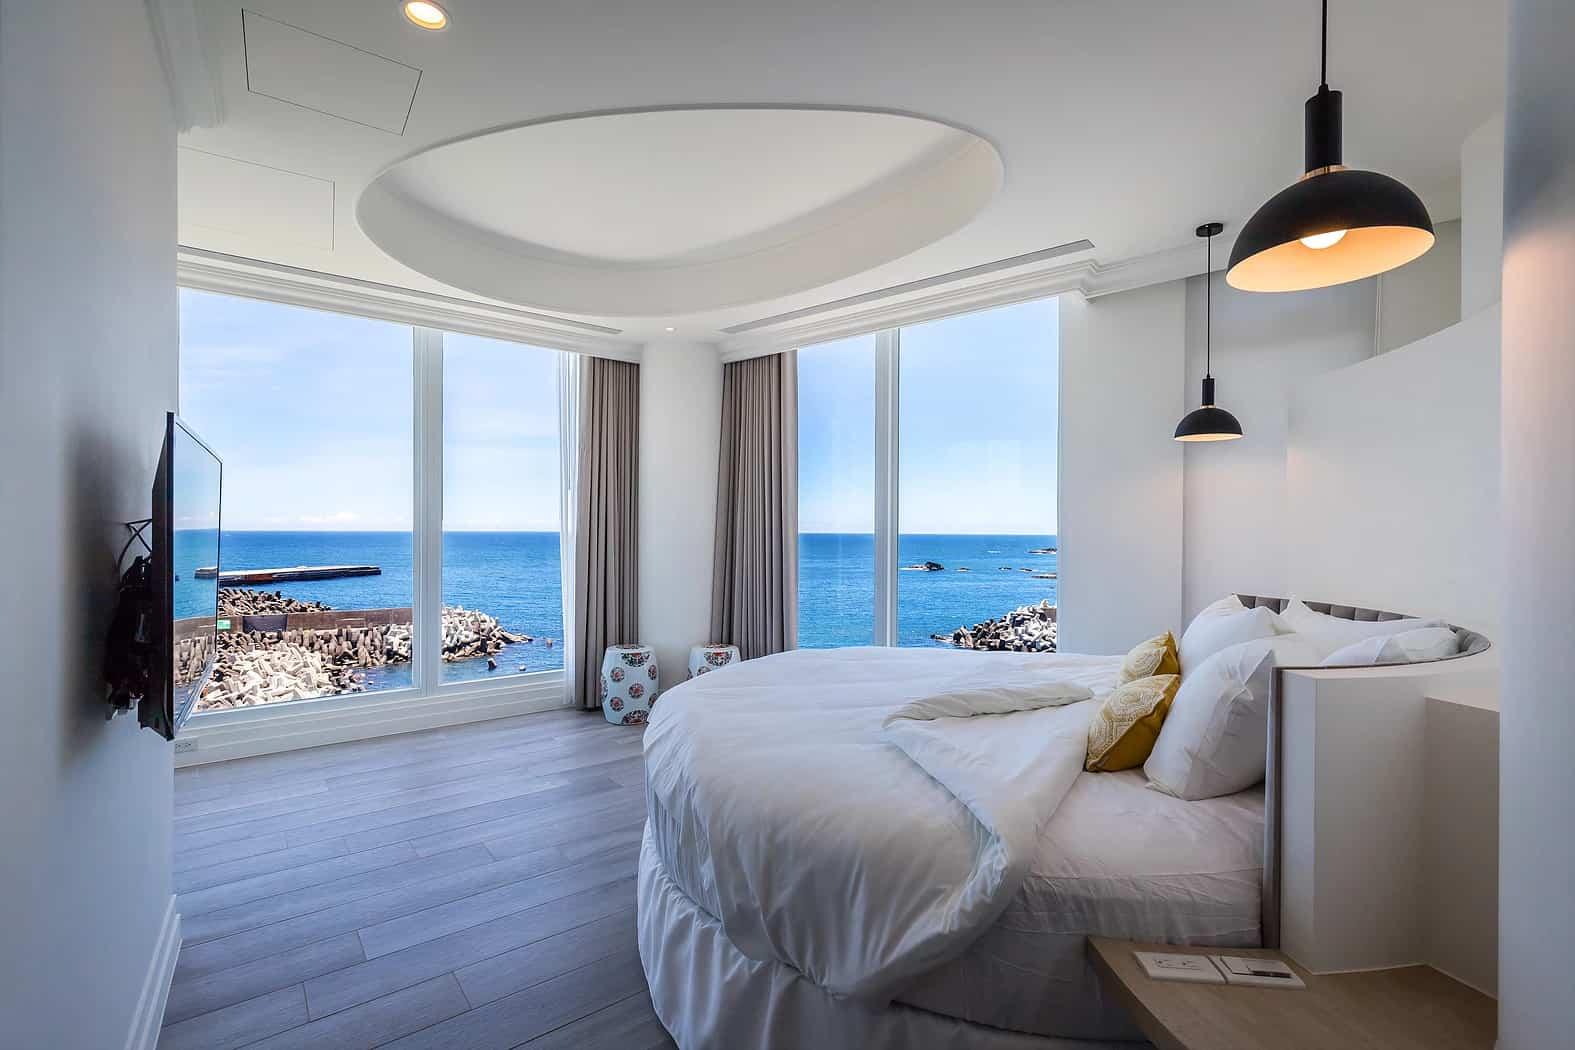 Brighthouse-Hotel-Yilan-Deluxe-Ocean-Room-1.jpg